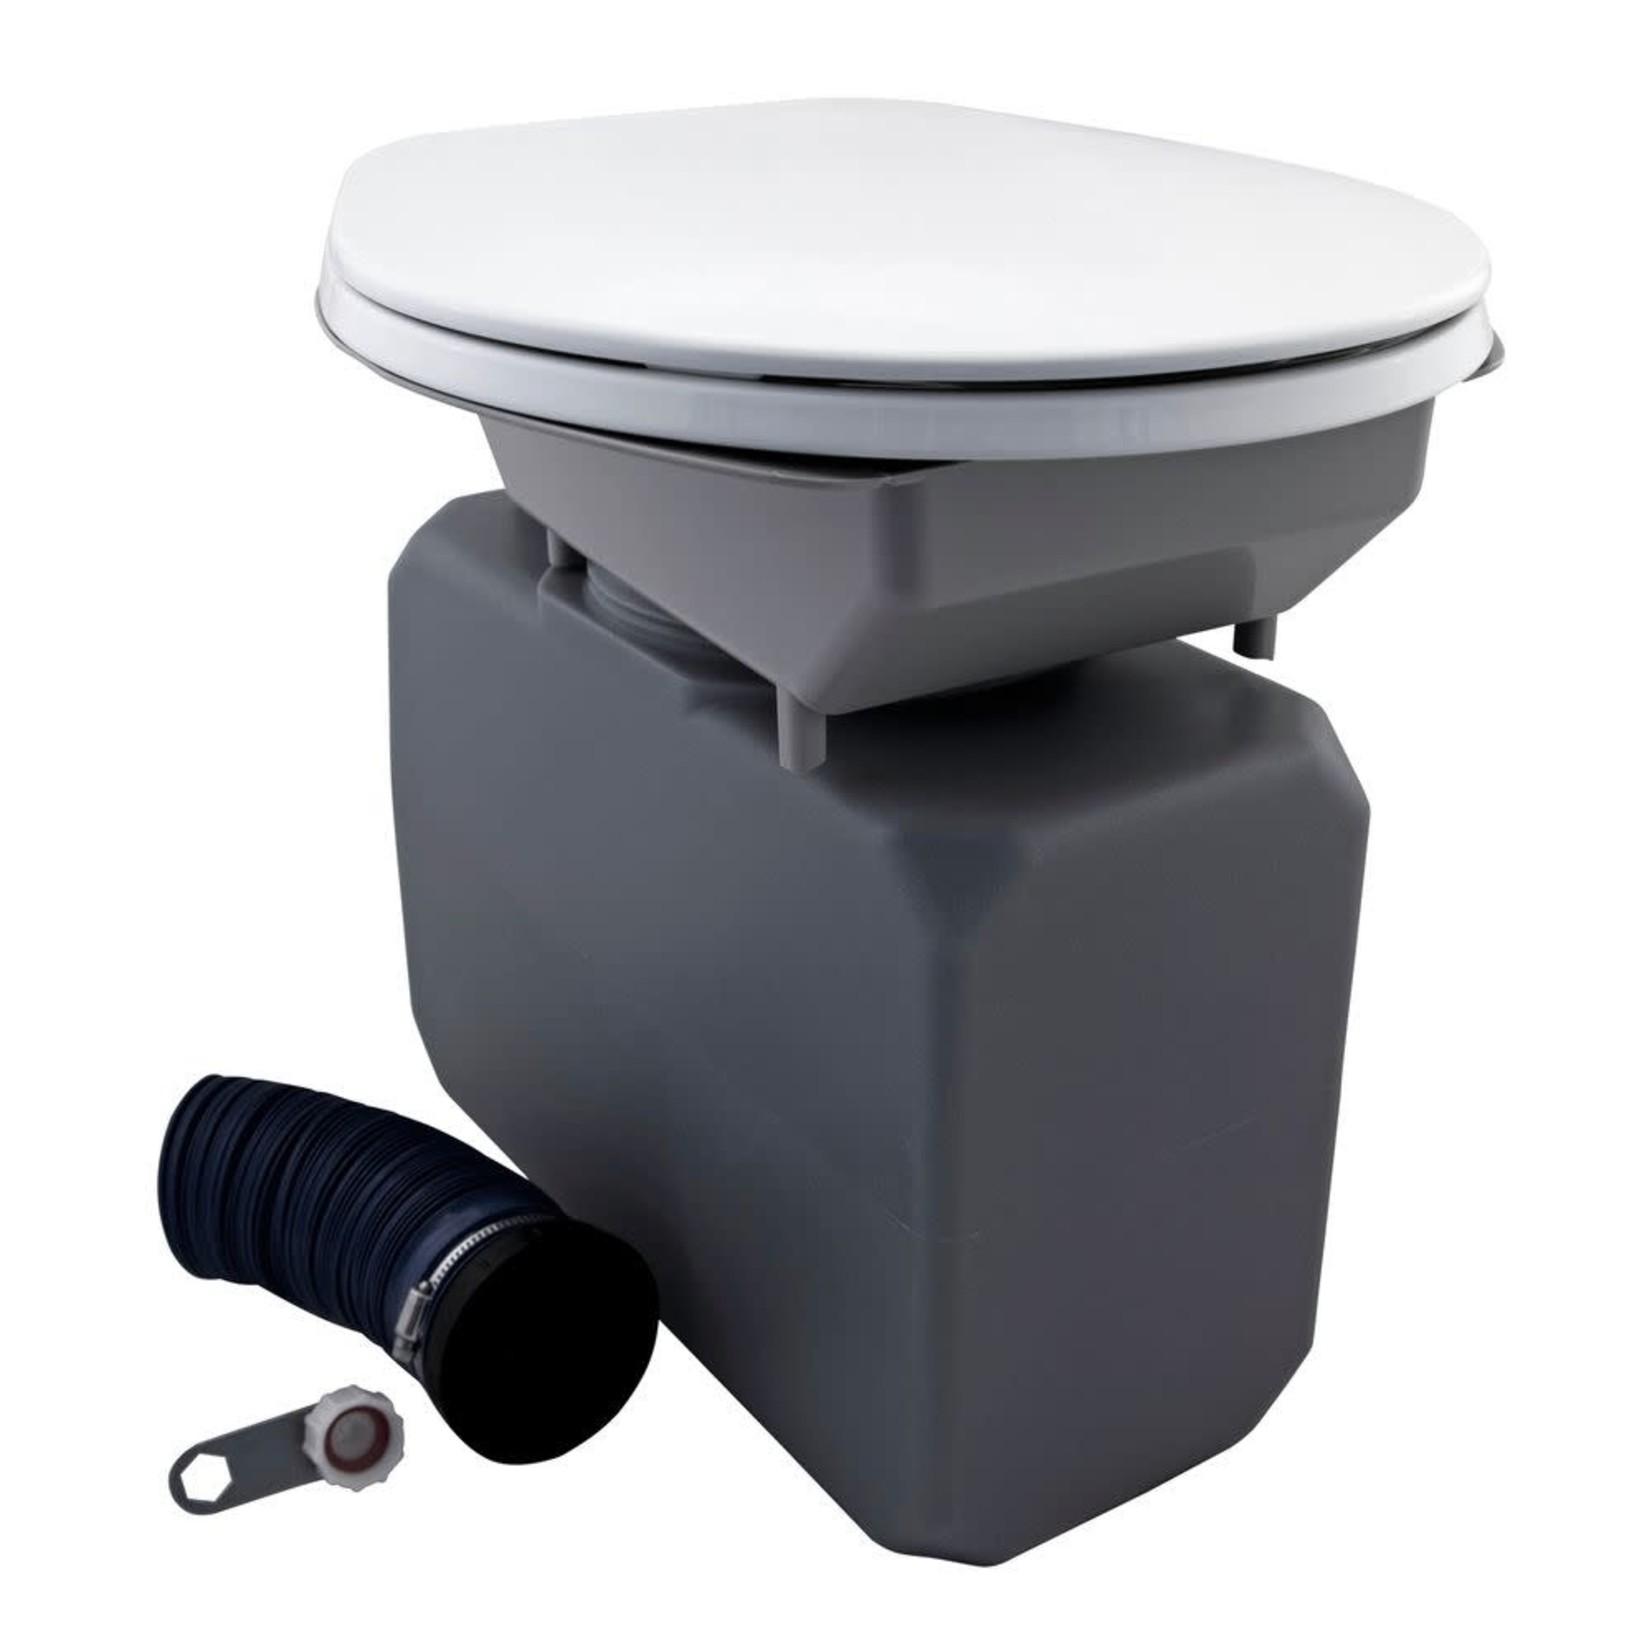 ECO-Safe Toilet System